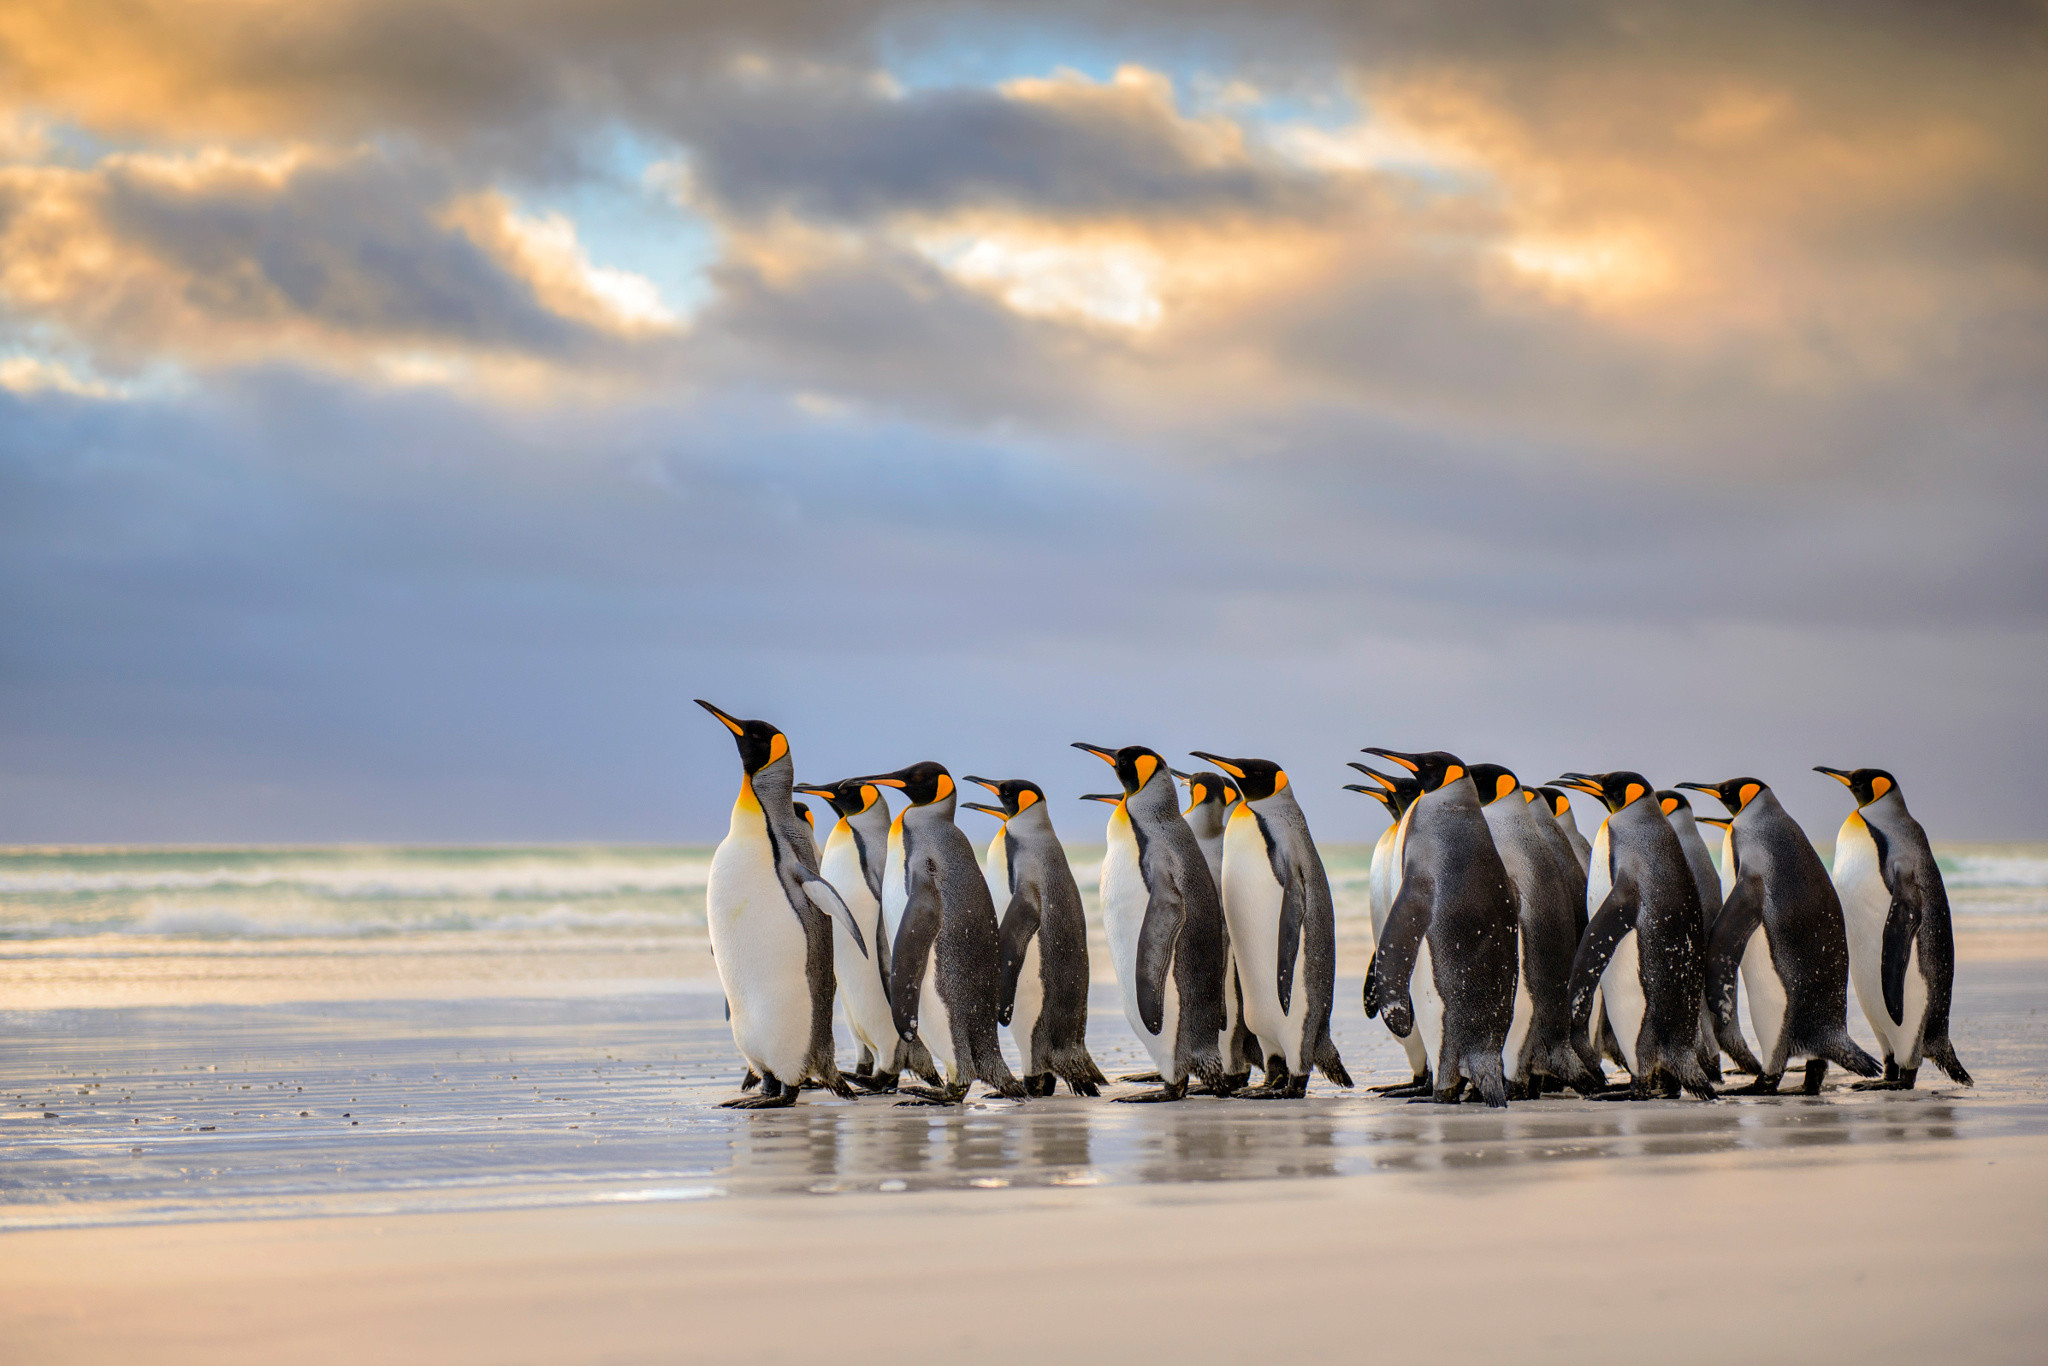 King penguin, Falkland Islands, penguin, Atlantic ocean, beach, ocean,  clouds